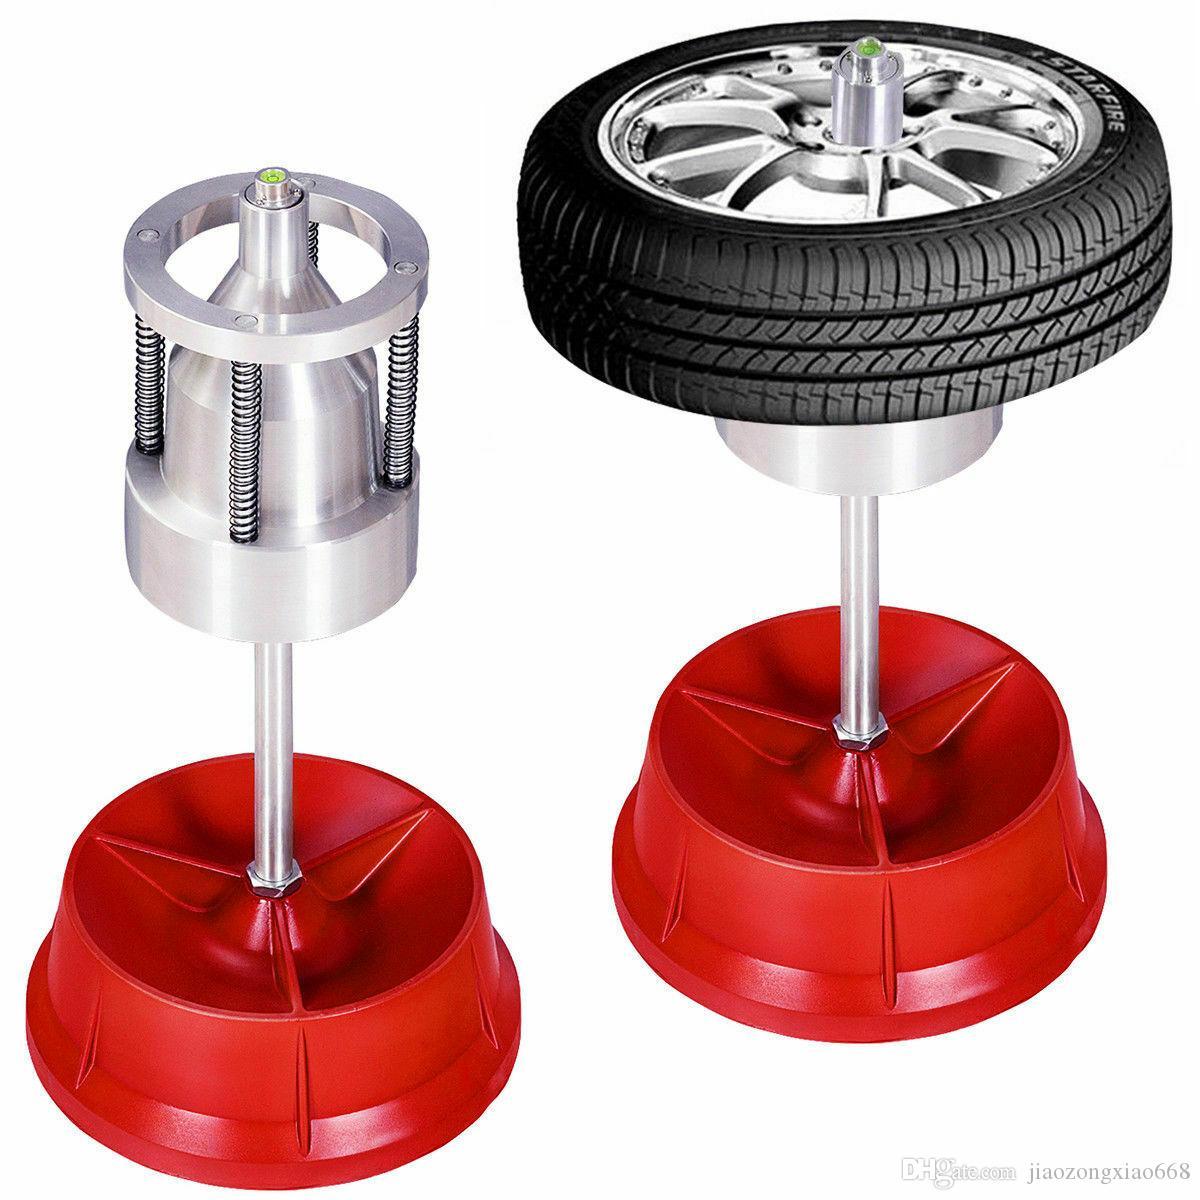 Pro Portable Hubs Wheel Balancer W// Bubble Level Heavy Duty Rim Tire Cars Truck